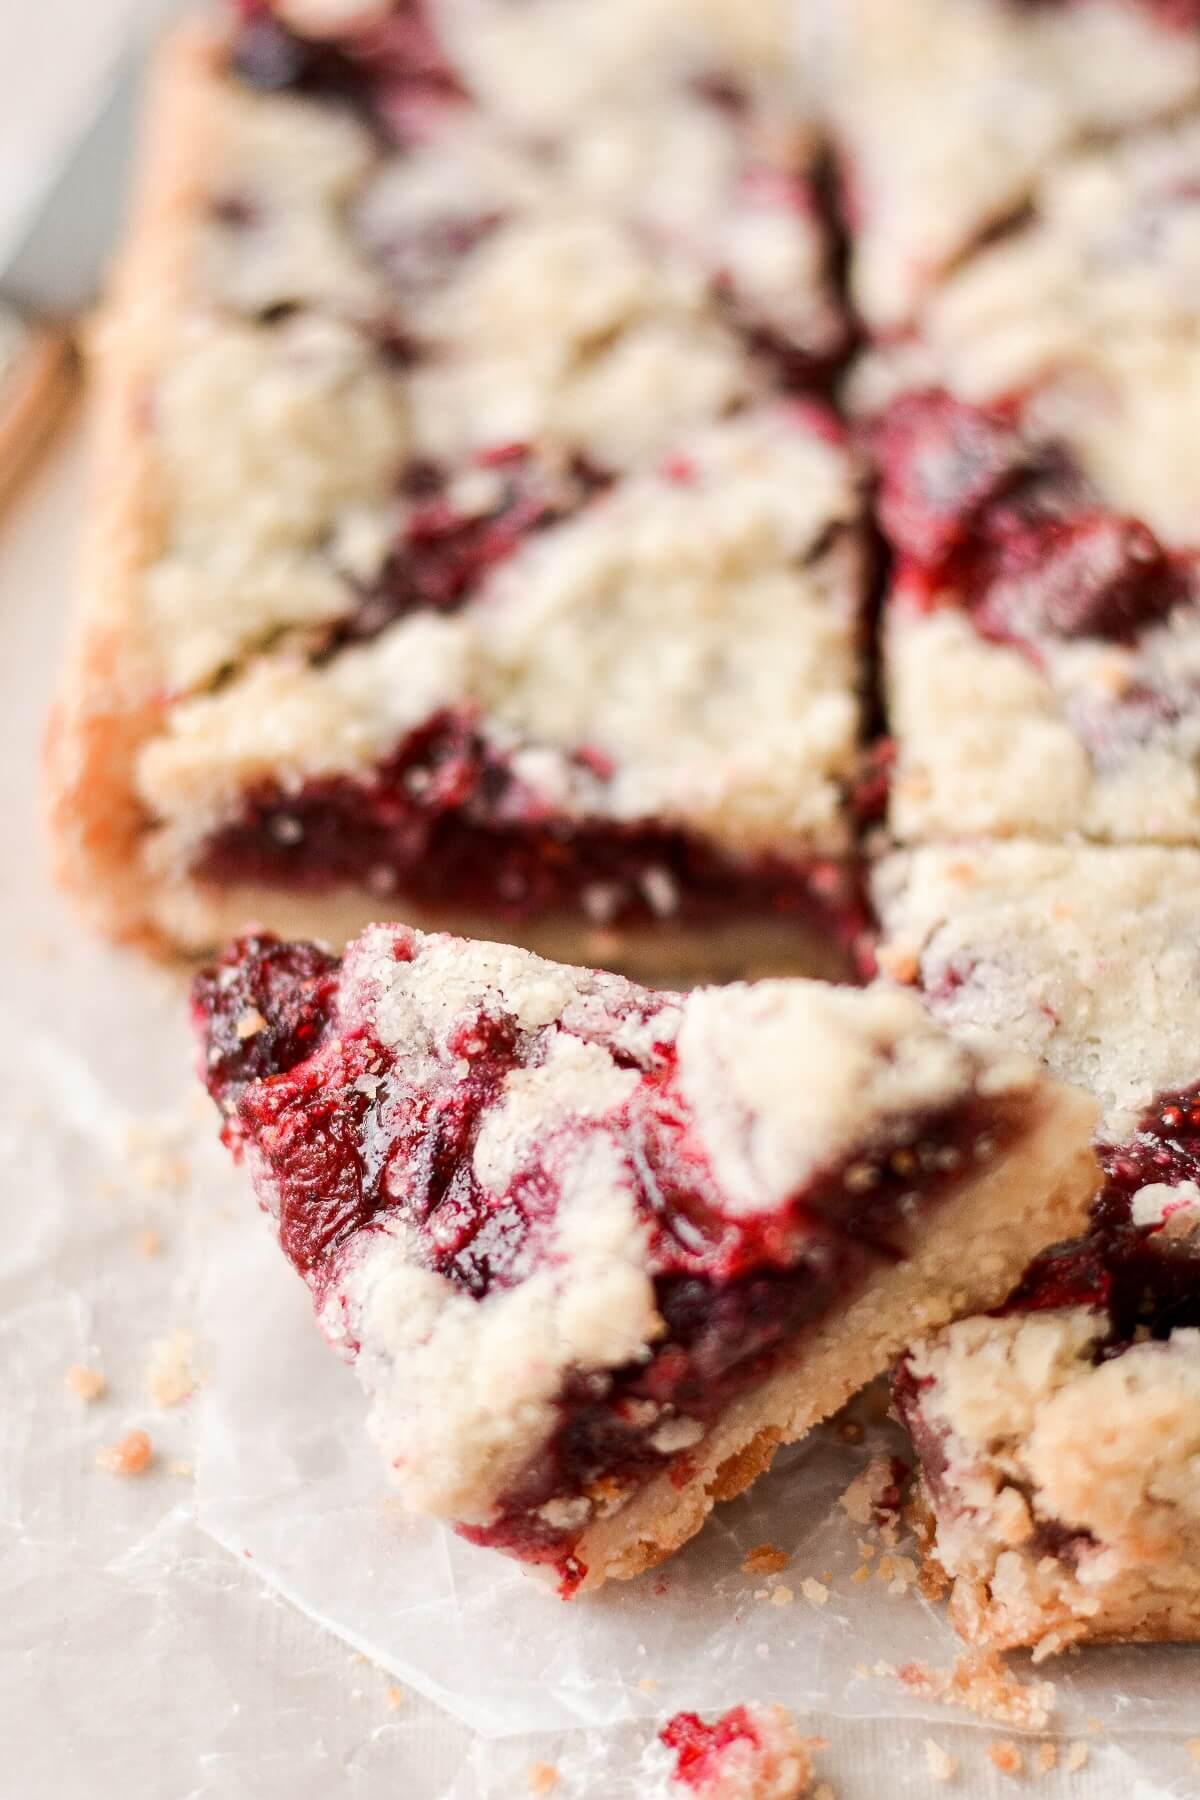 Cranberry almond shortbread crumb bars, cut into triangles.